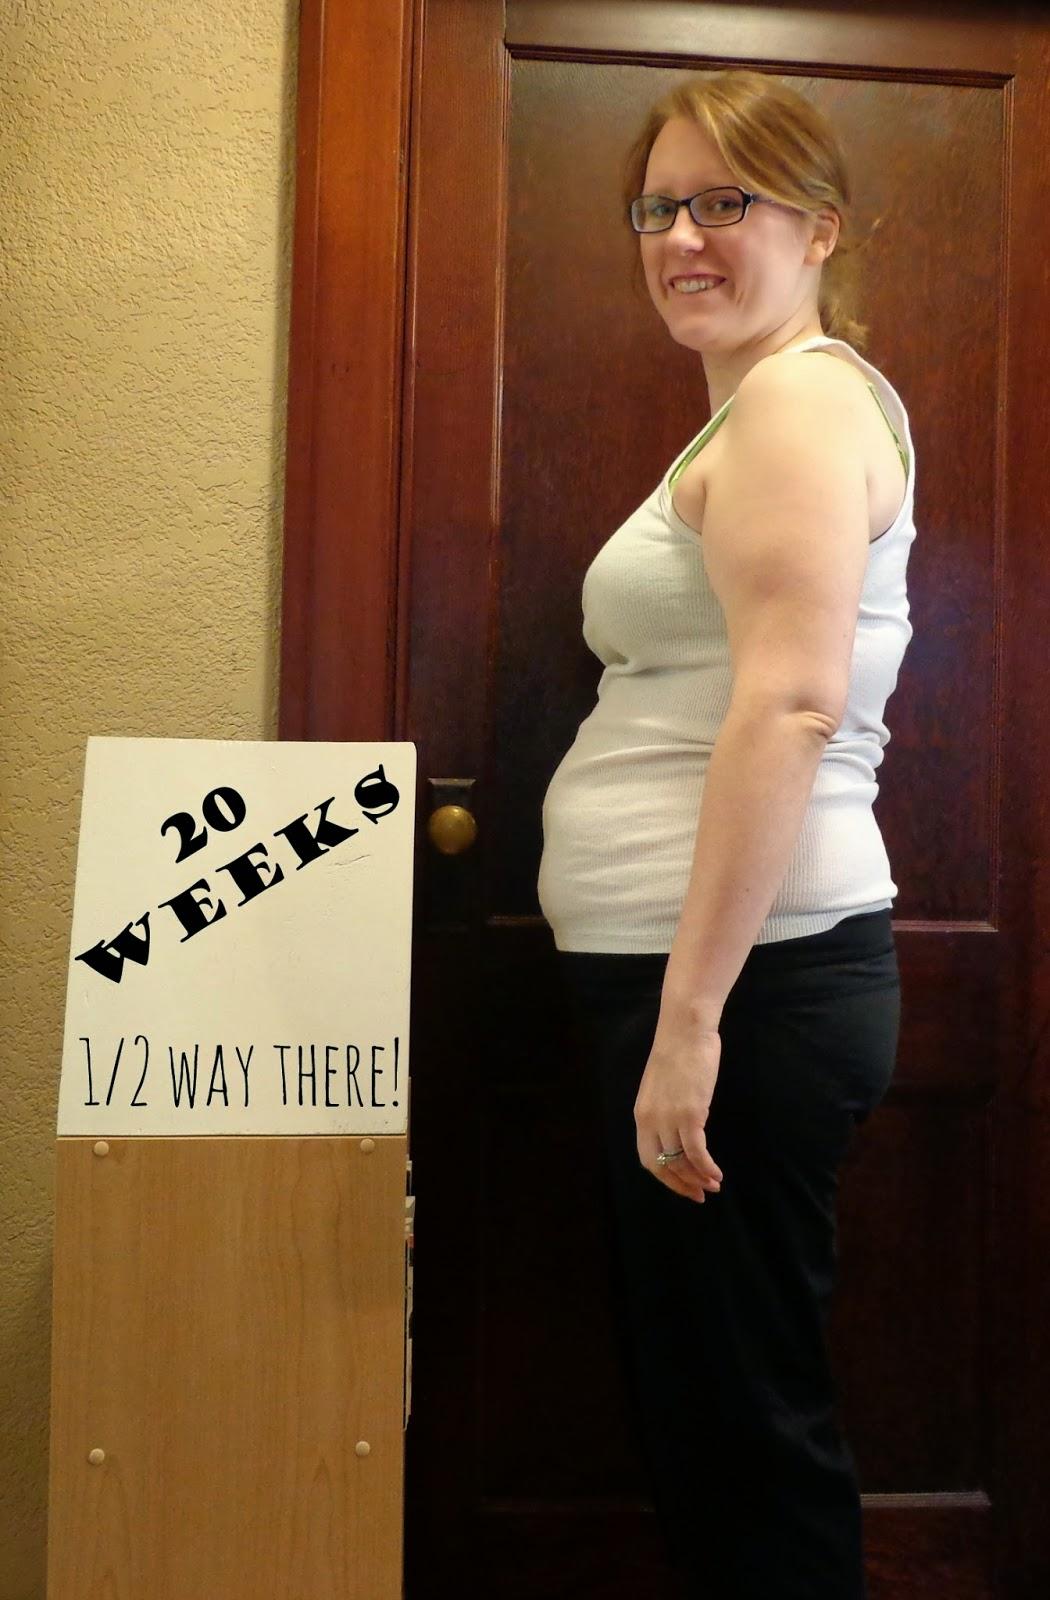 Week 20 Baby Bump